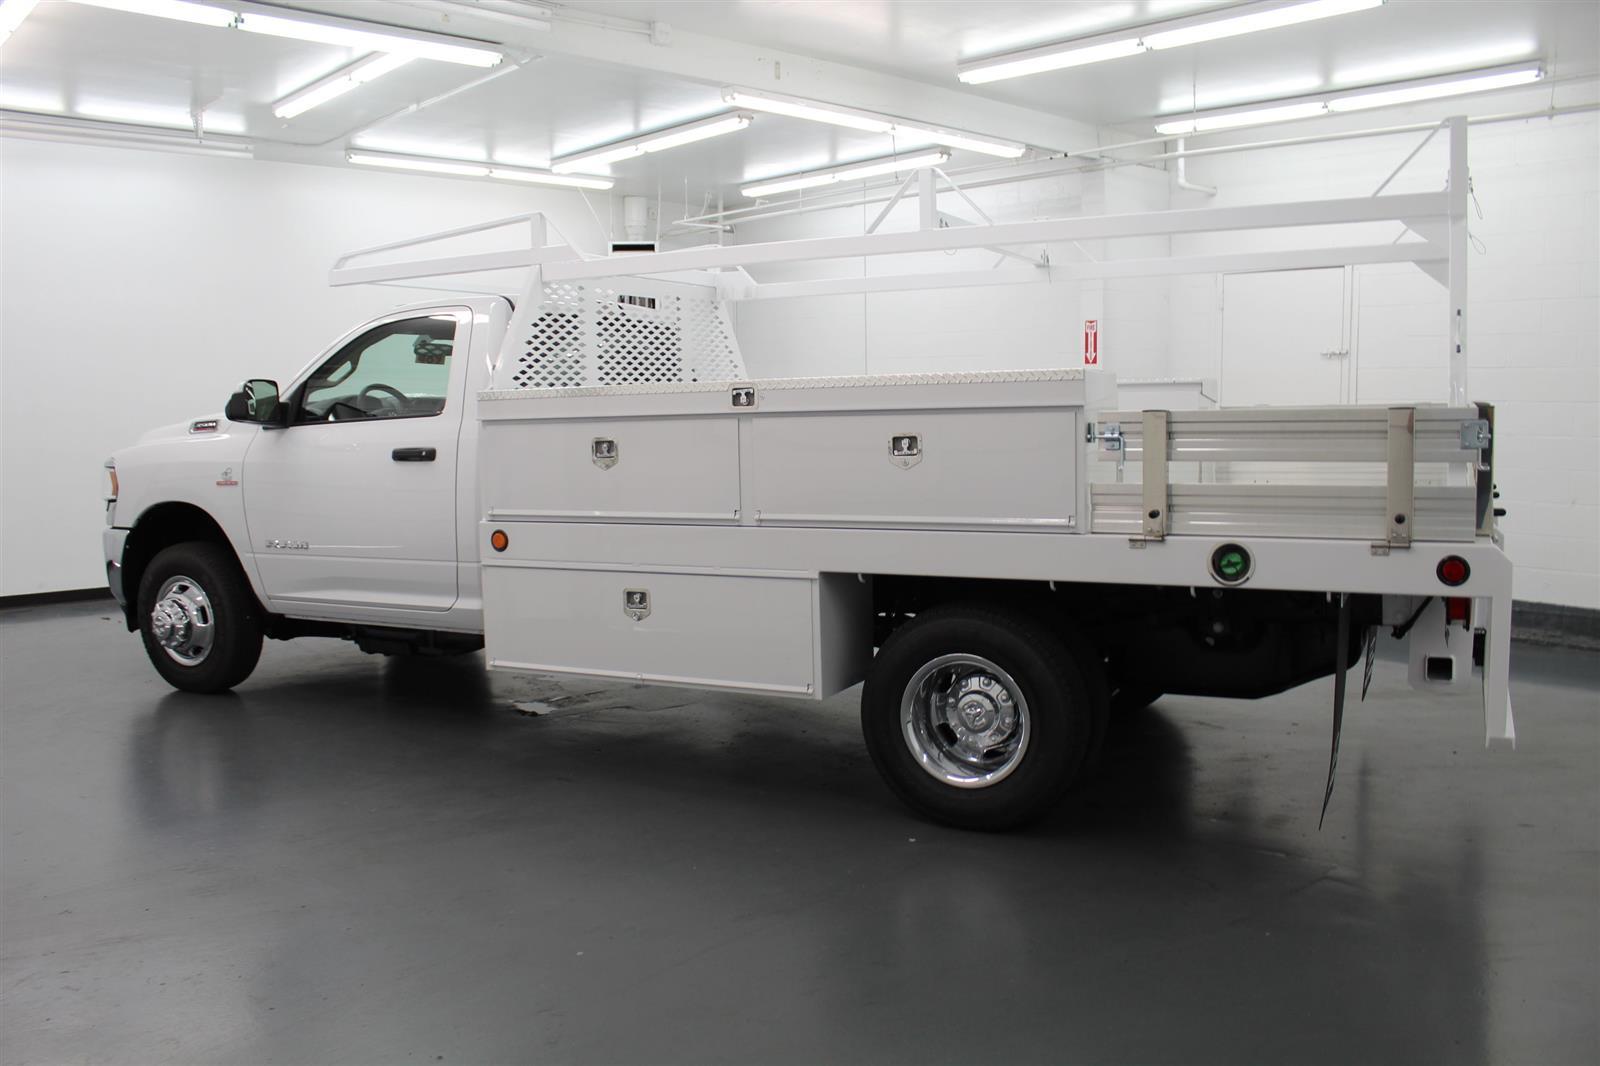 2020 Ram 3500 Regular Cab DRW 4x4, Scelzi Contractor Body #162365 - photo 1